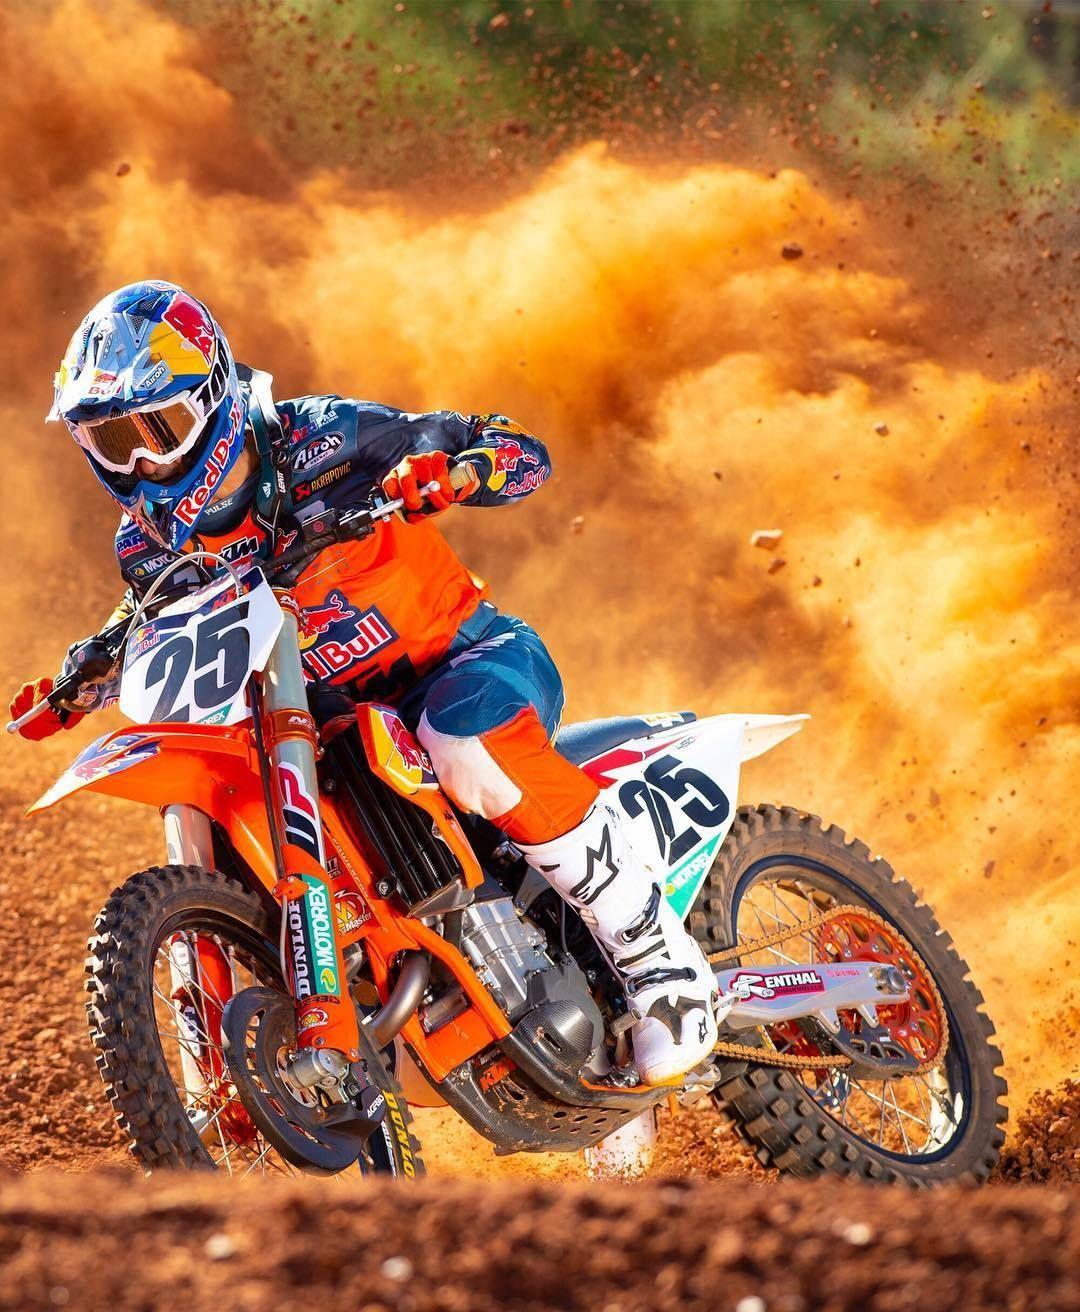 Cheaper Fashional Cool Dirt Bike Motorcycle 250cc - Buy ... |Dirt Bikes Cool And Fast